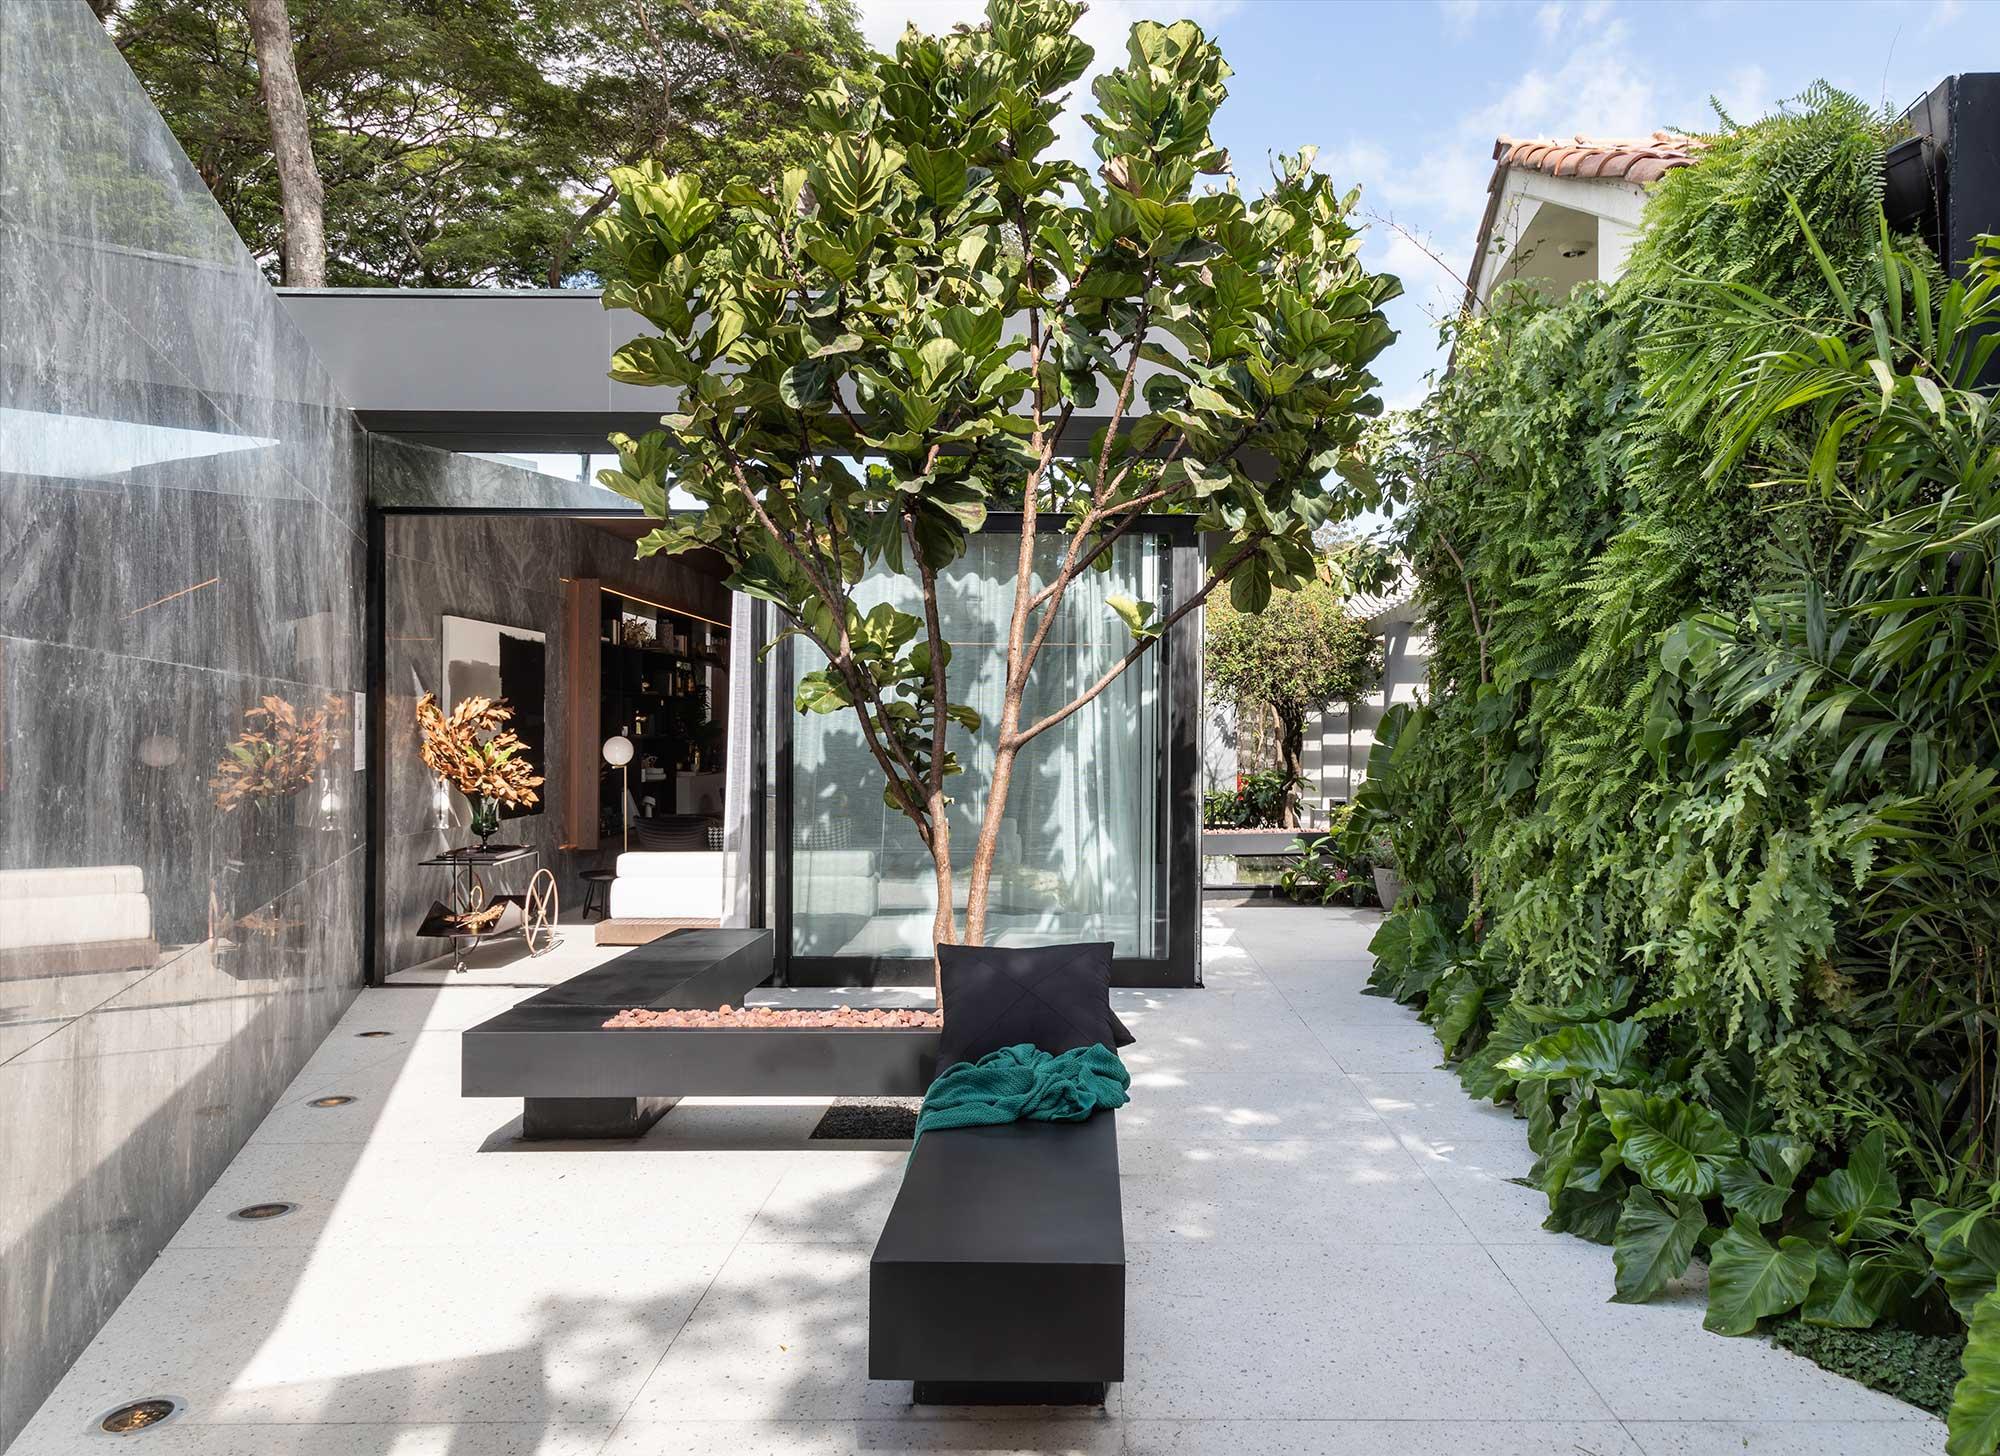 jardim dos sentidos bia abreu casacor sao paulo 2019 jardim vertical varanda minimalista